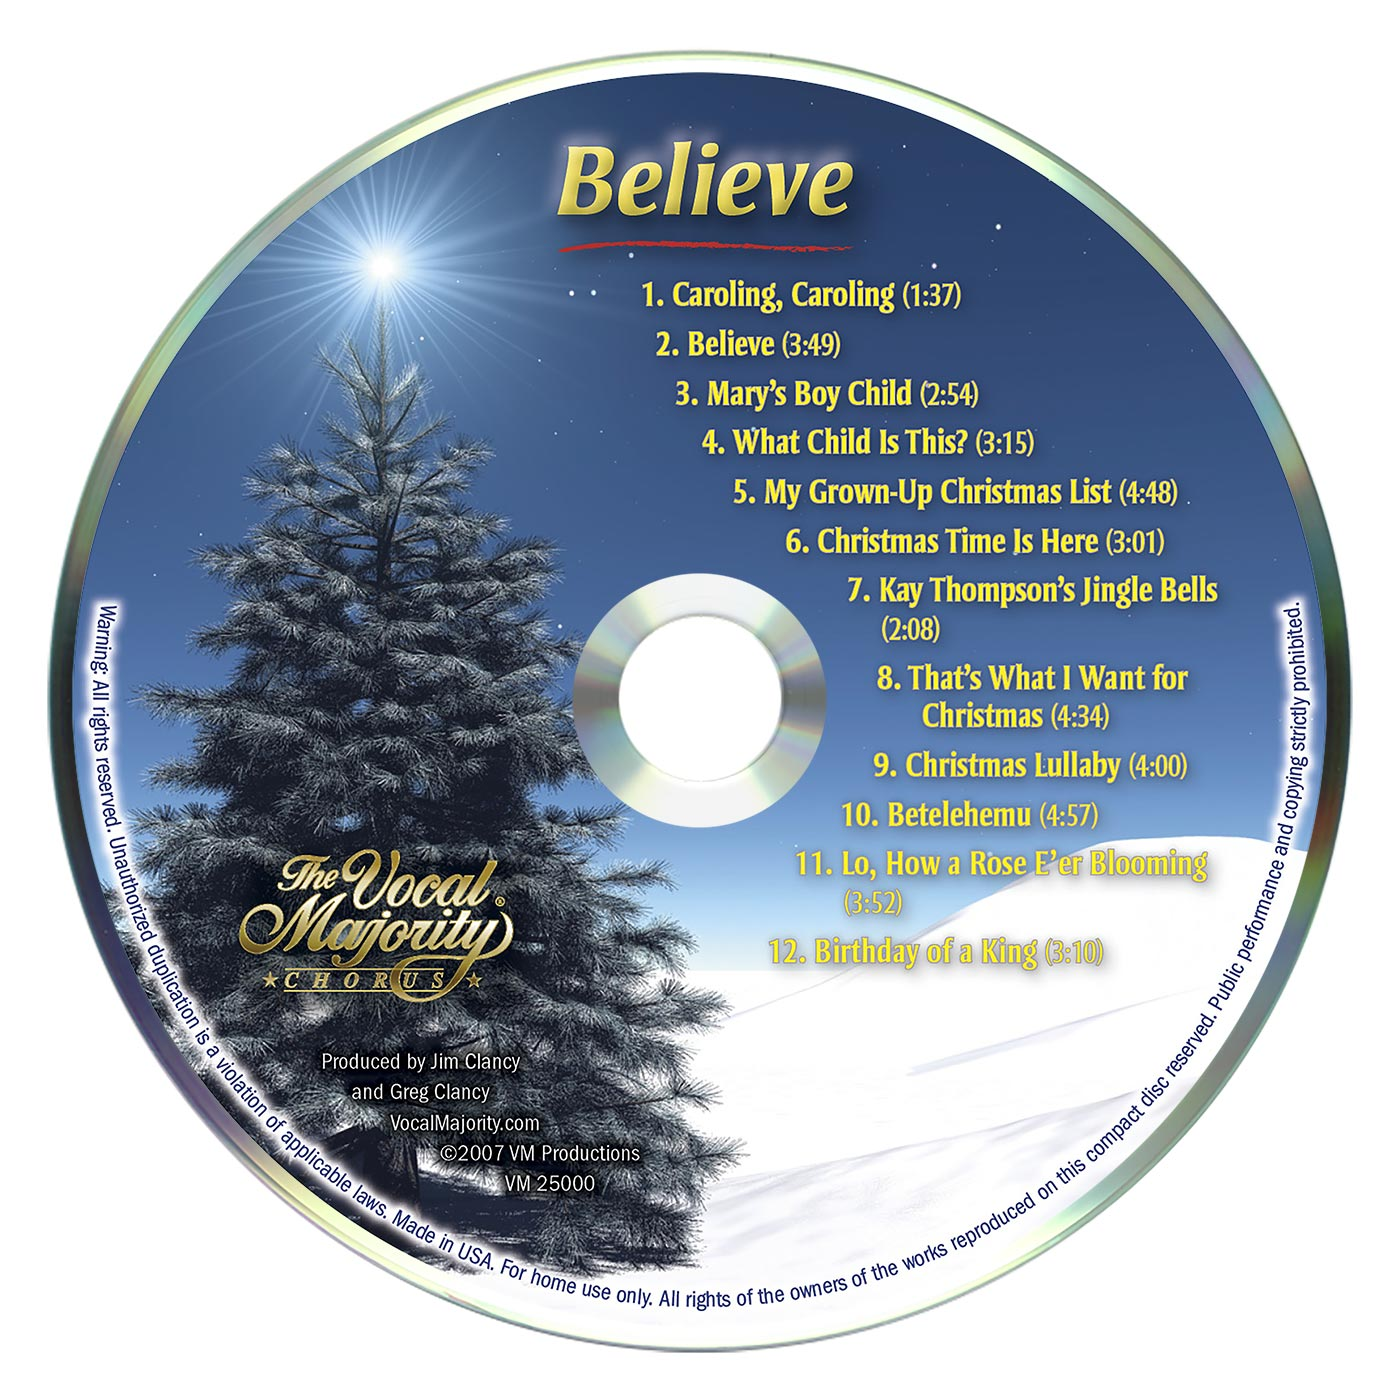 Disc Art: Believe